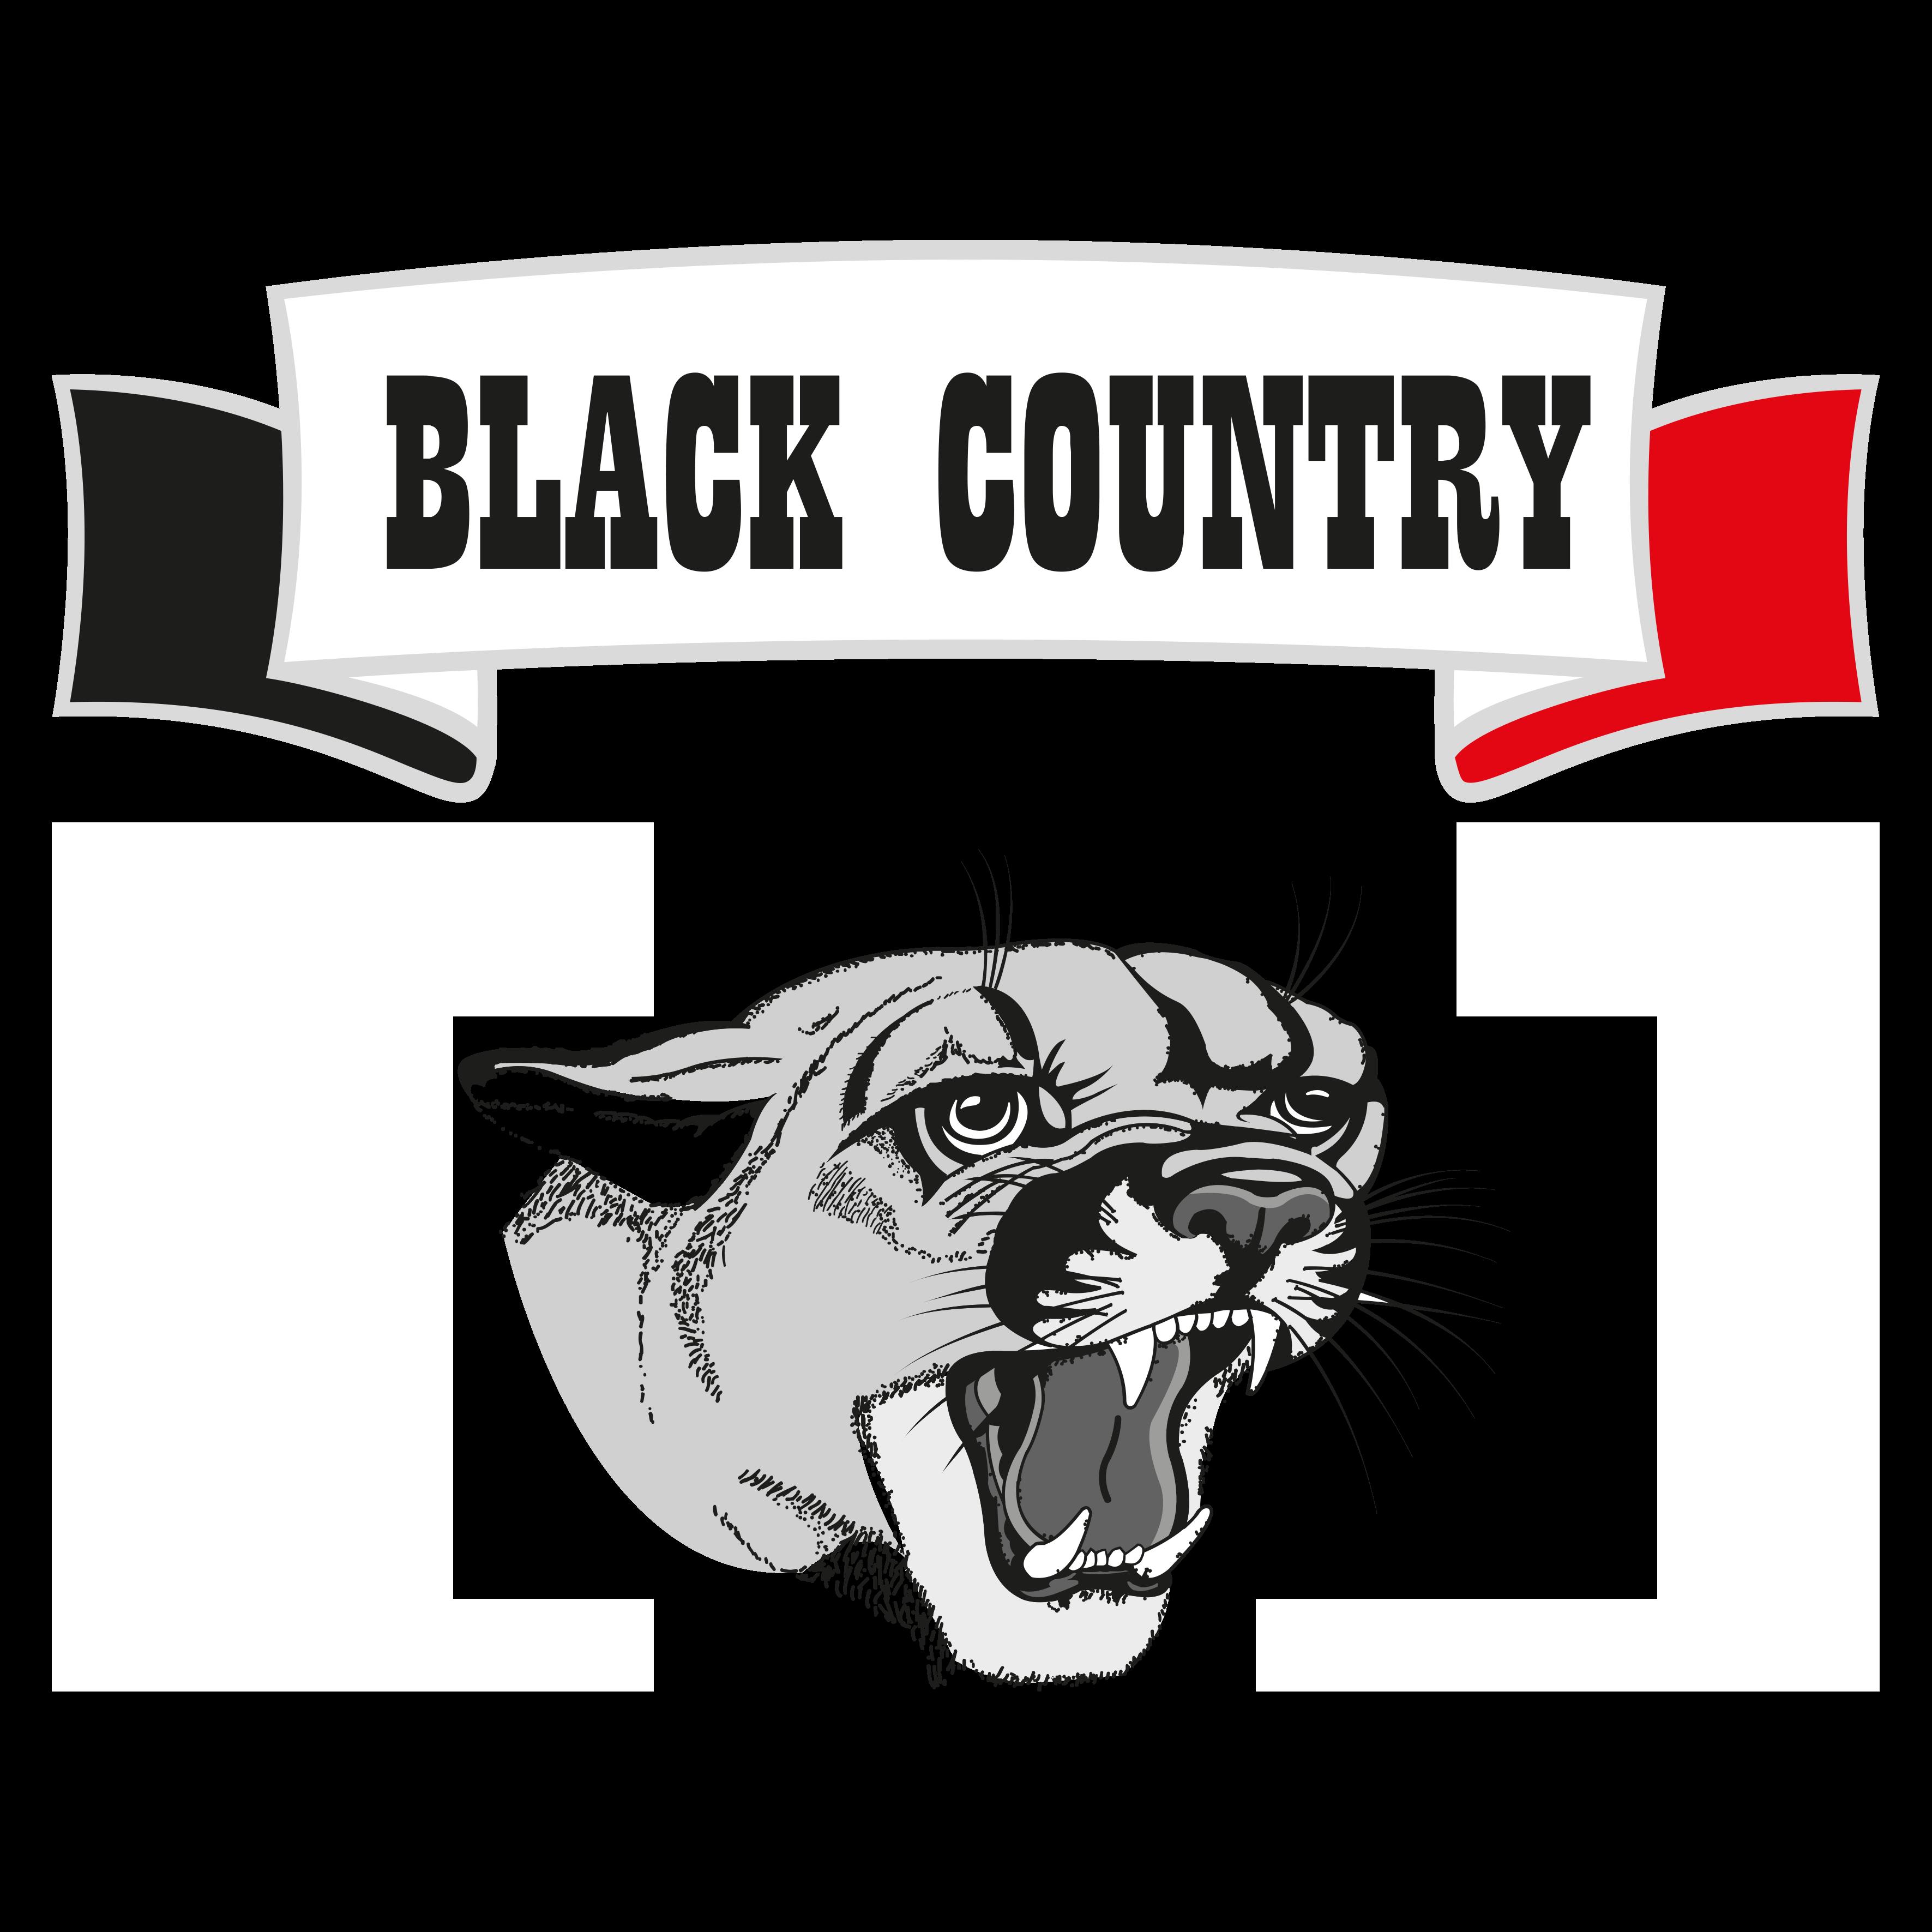 BLC009 - Black Country